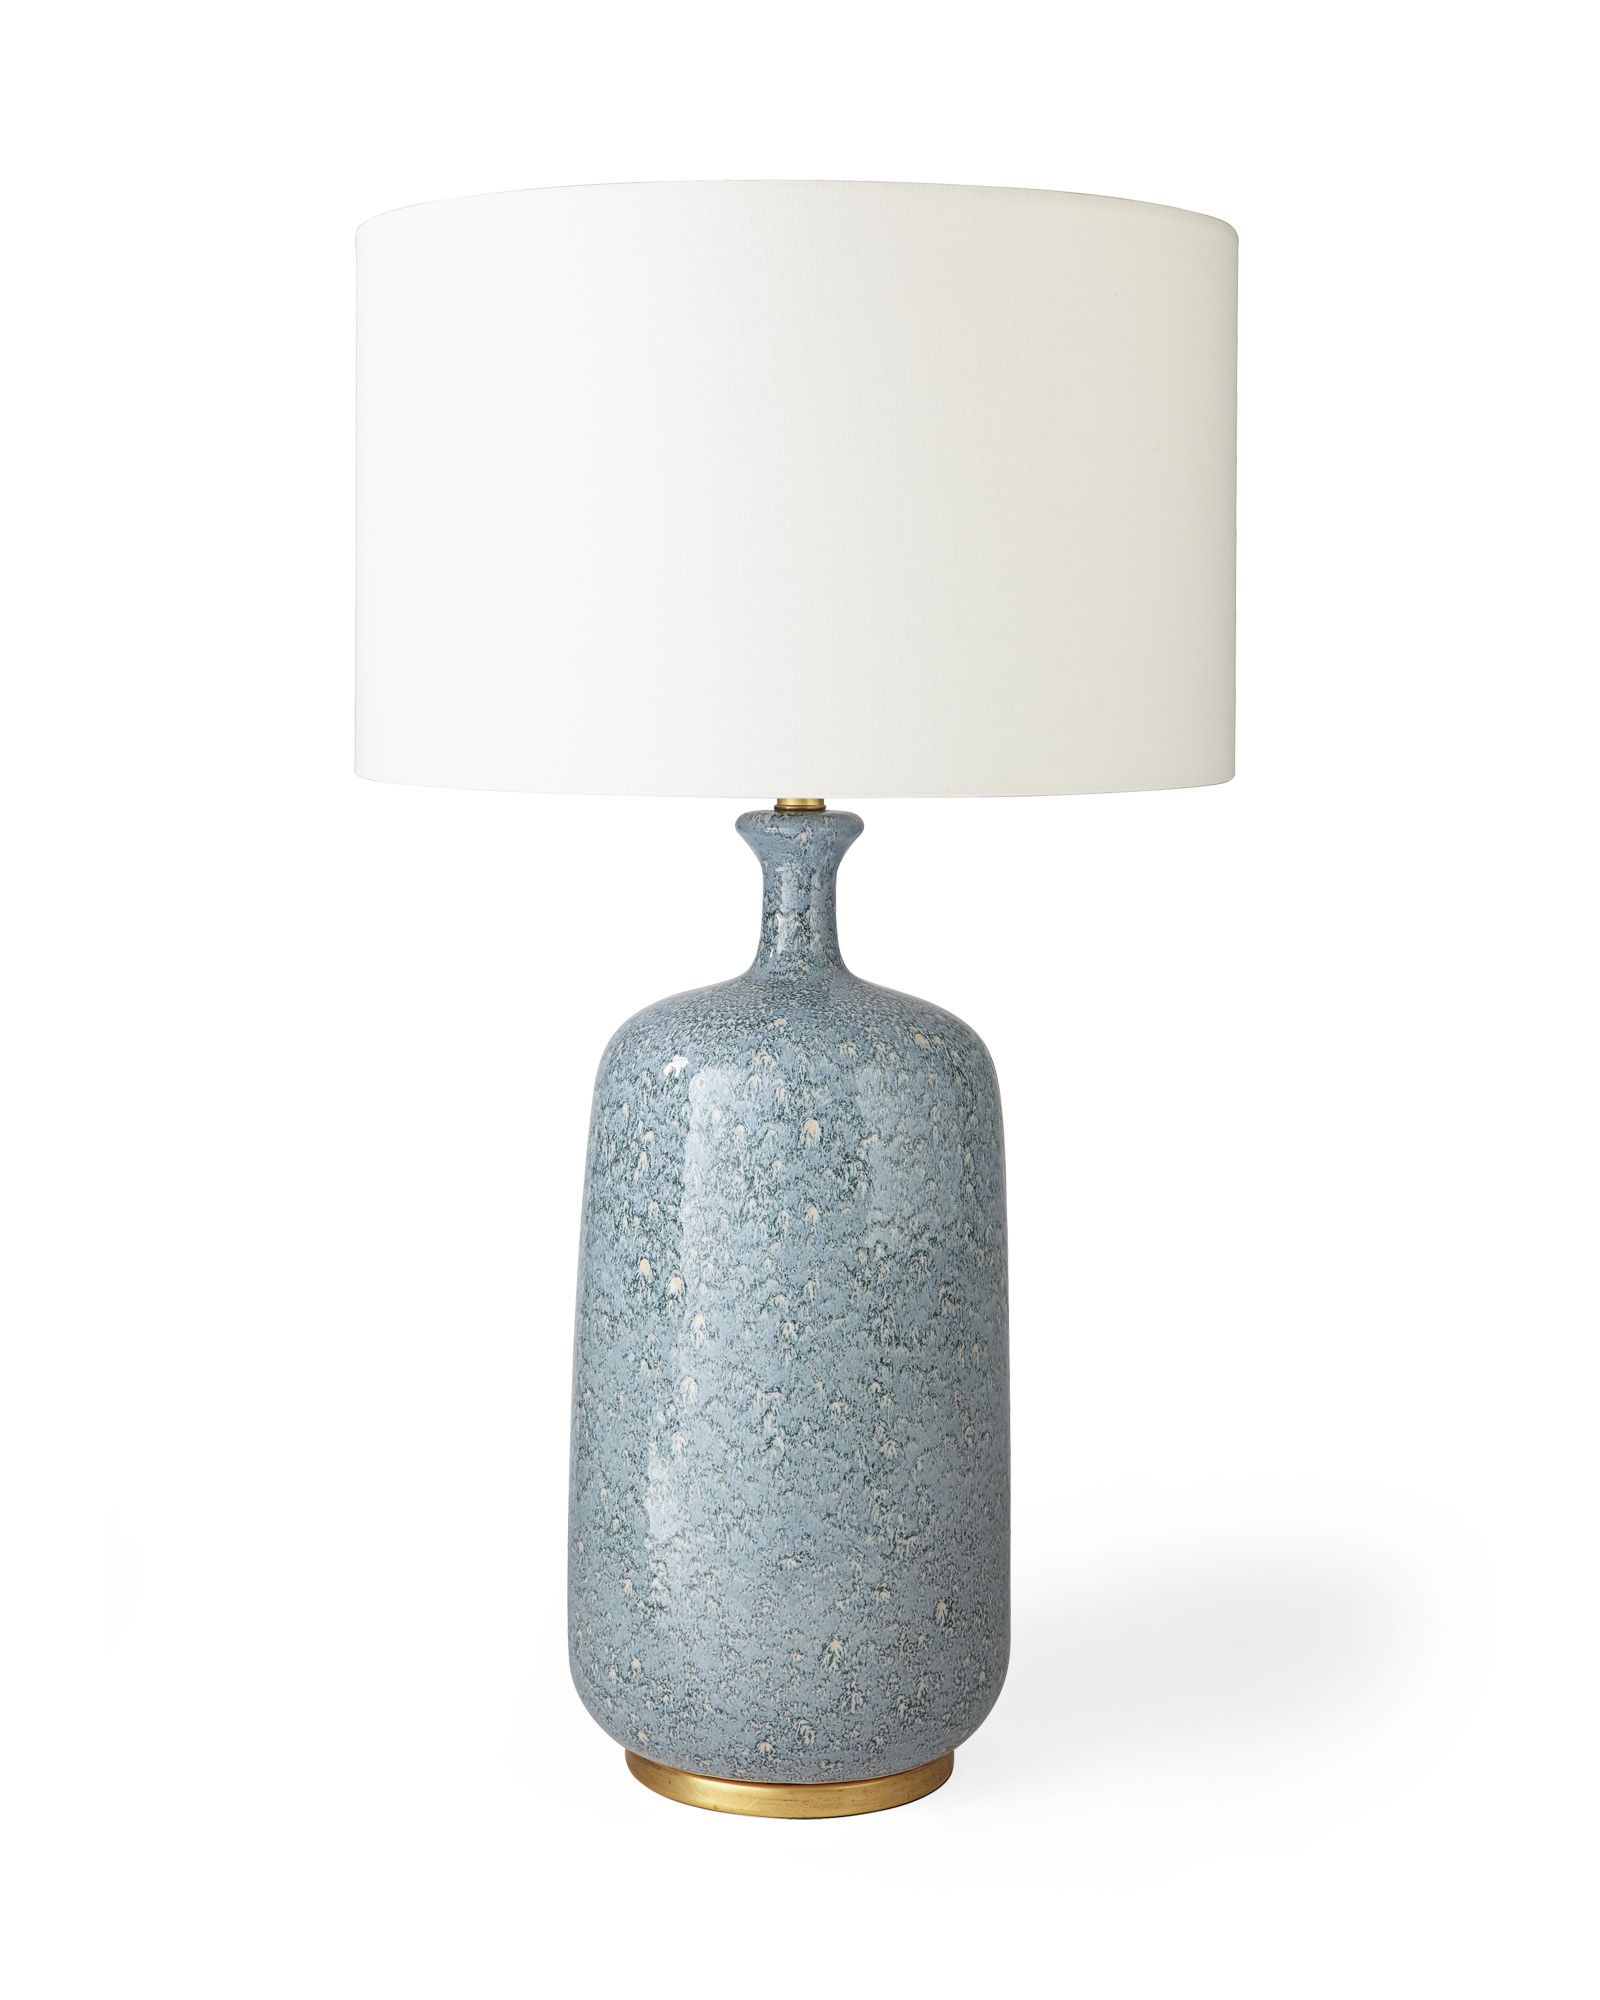 Hattie Table LampHattie Table Lamp x overall